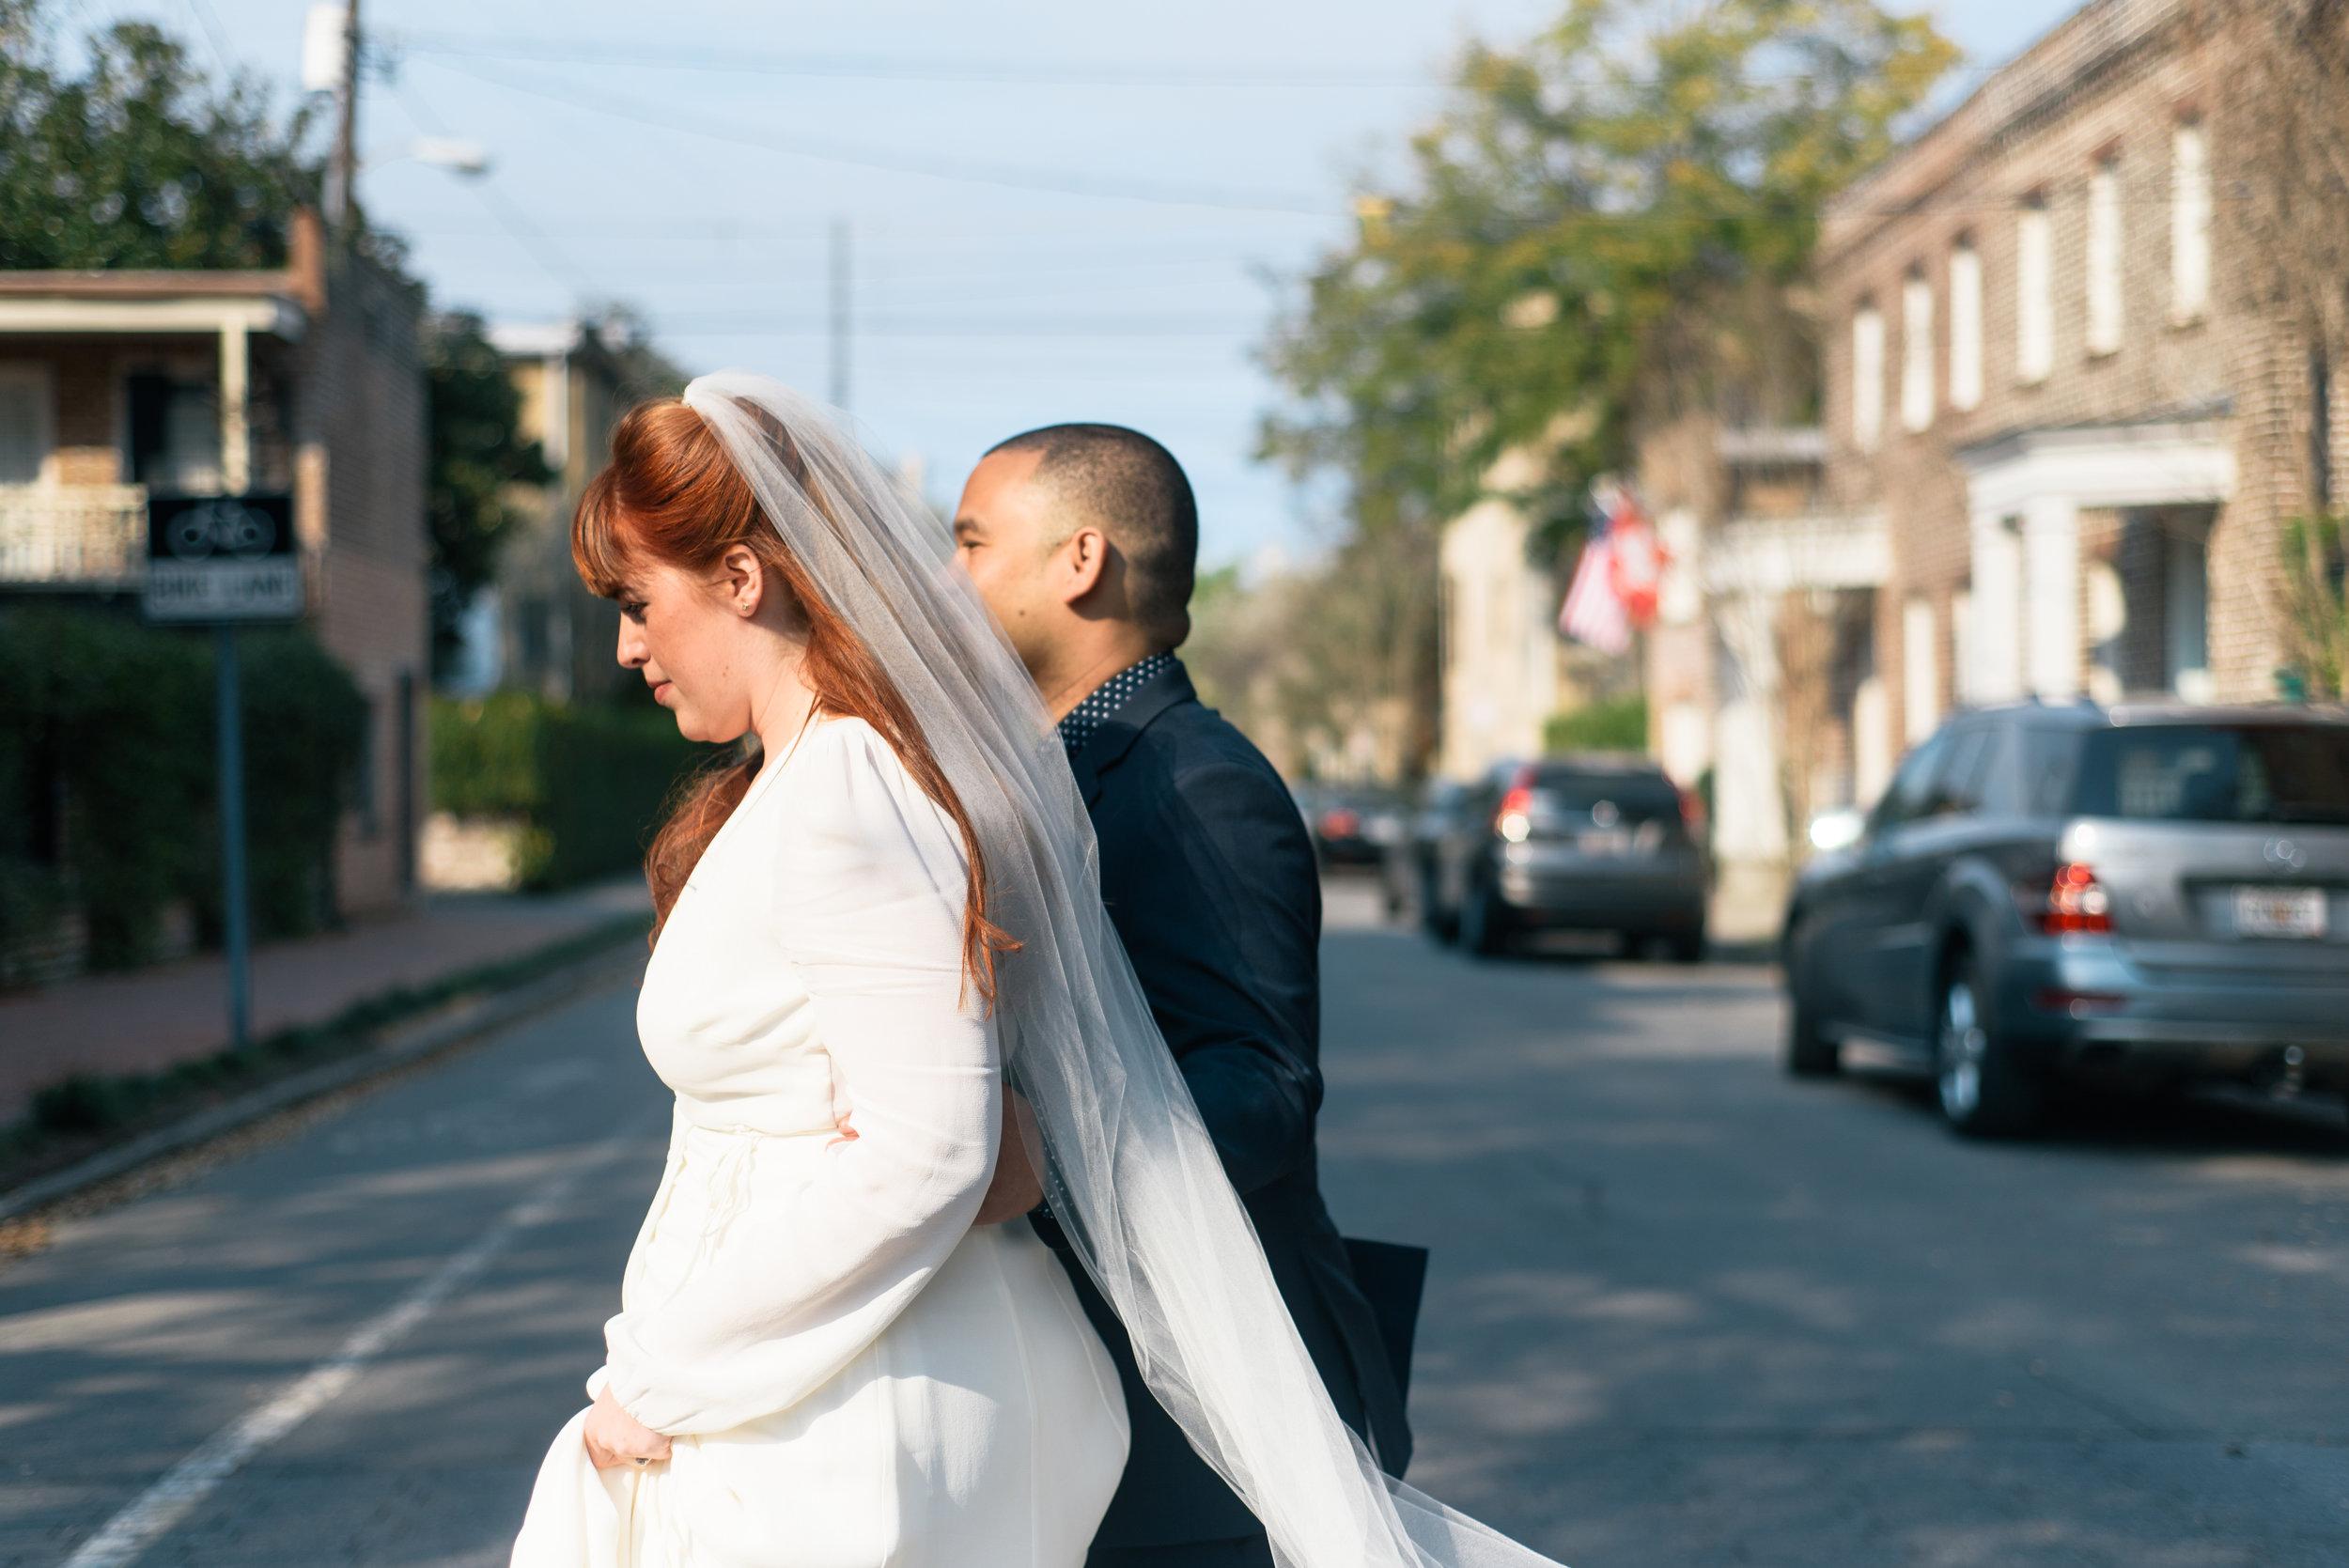 savannah-elopement-photography-savannah-georgia-elopement-photographer-savannah-wedding-photographer-meg-hill-photo-jade-hill- (19 of 58).jpg